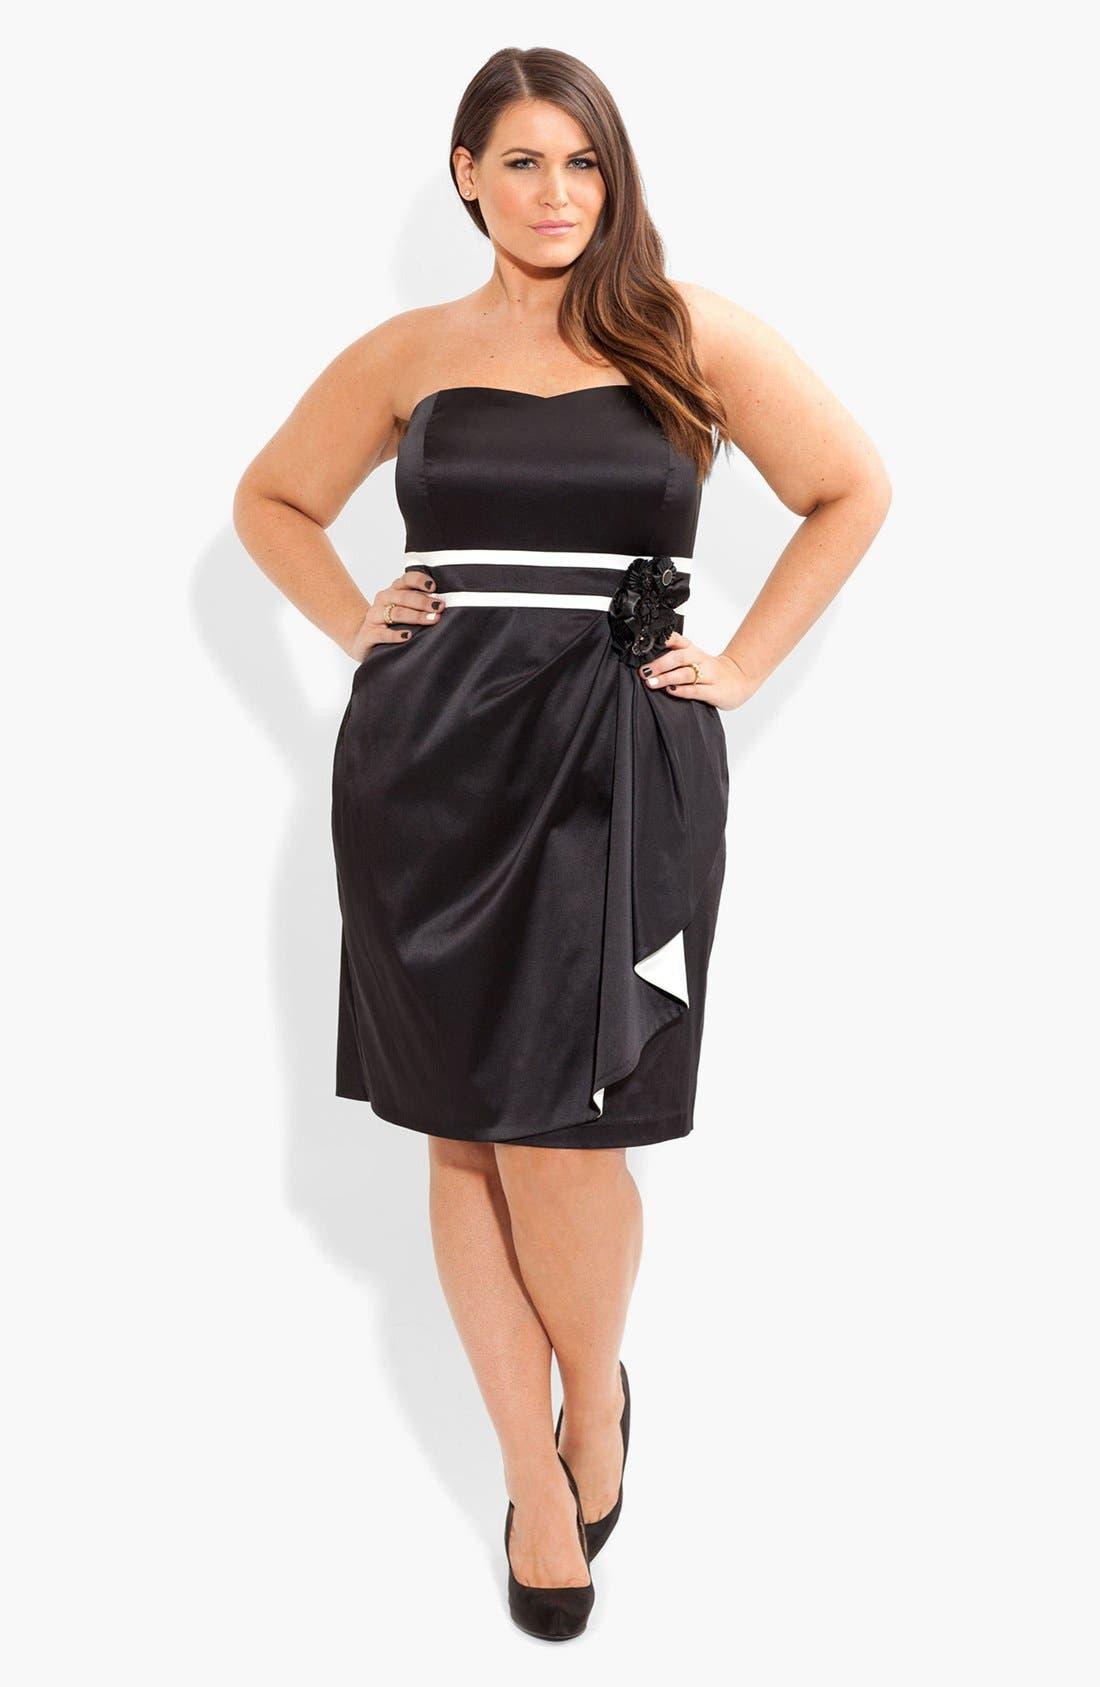 Alternate Image 1 Selected - City Chic 'Melissa' Embellished Contrast Trim Sheath Dress (Plus Size)